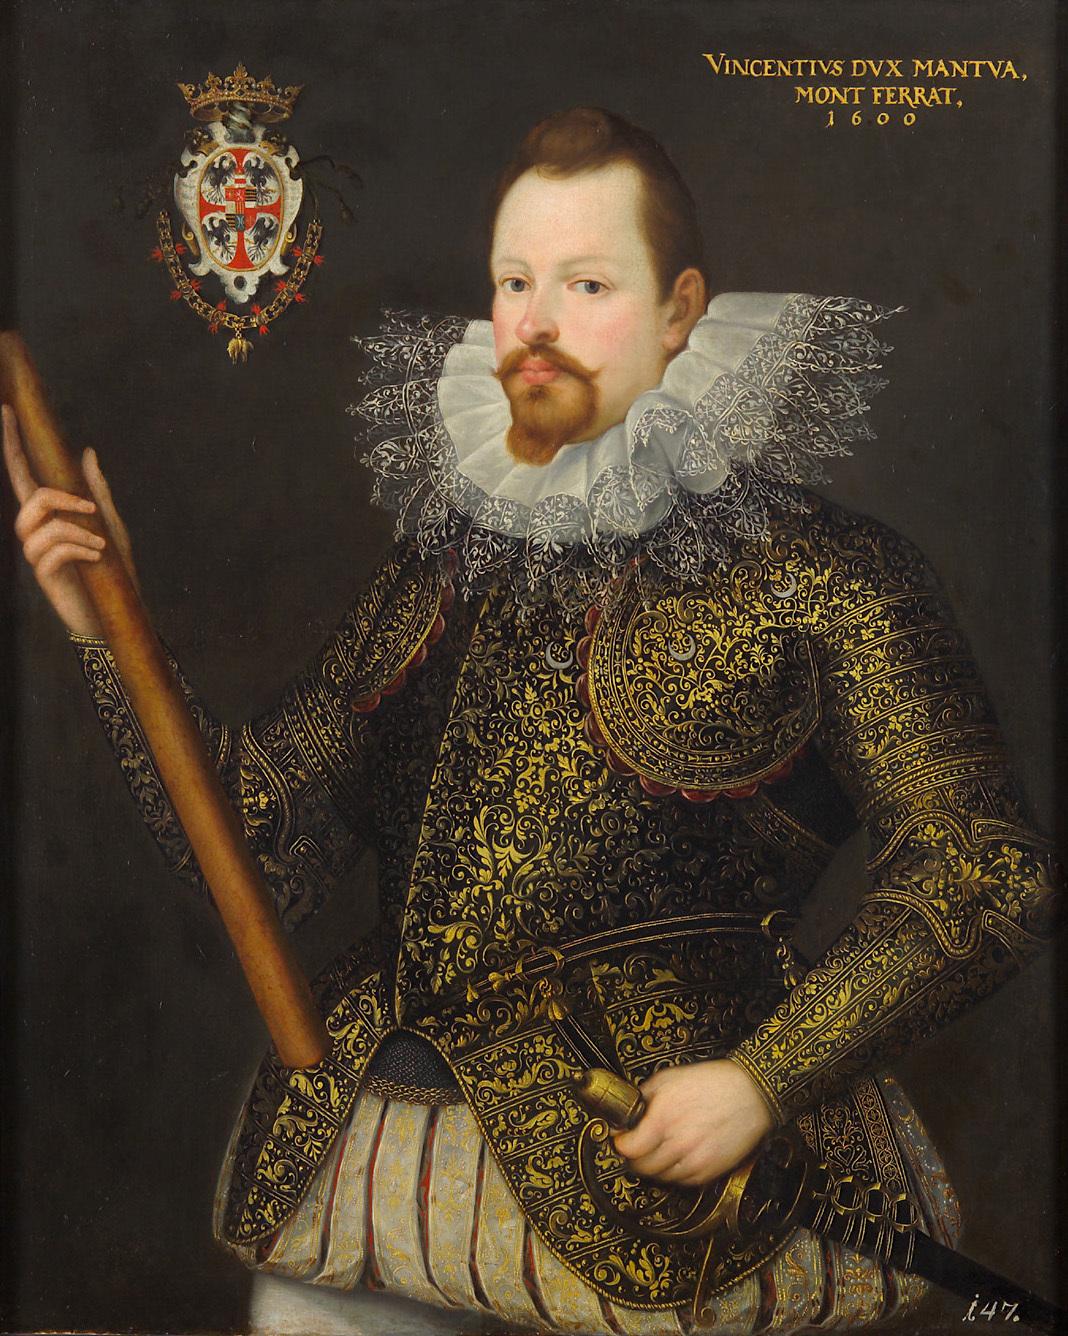 Vicenzo I. Gonzaga, Herzog von Mantua, Halbfigur von Frans Pourbus d. J.